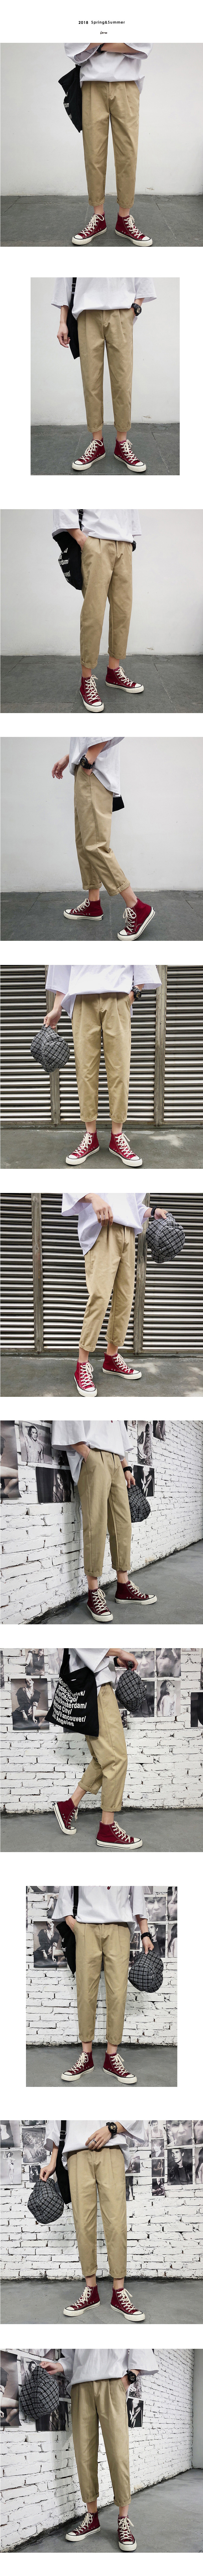 K891/P45加绒/P50加厚韩版休闲裤男宽松长裤潮直筒帅气大码男裤子